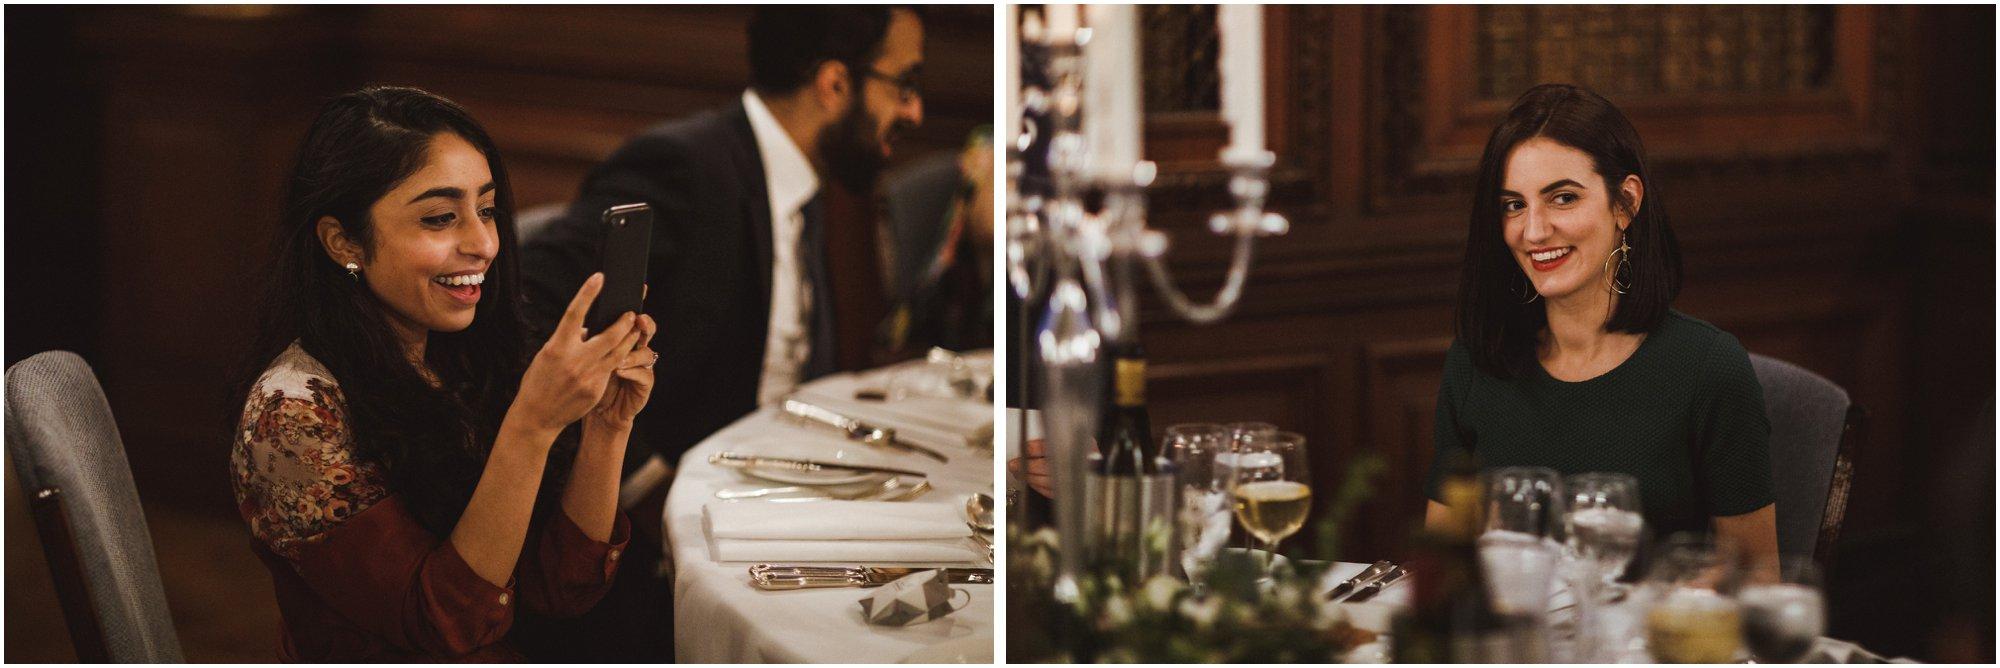 Burghley House Wedding Stamford_0123.jpg